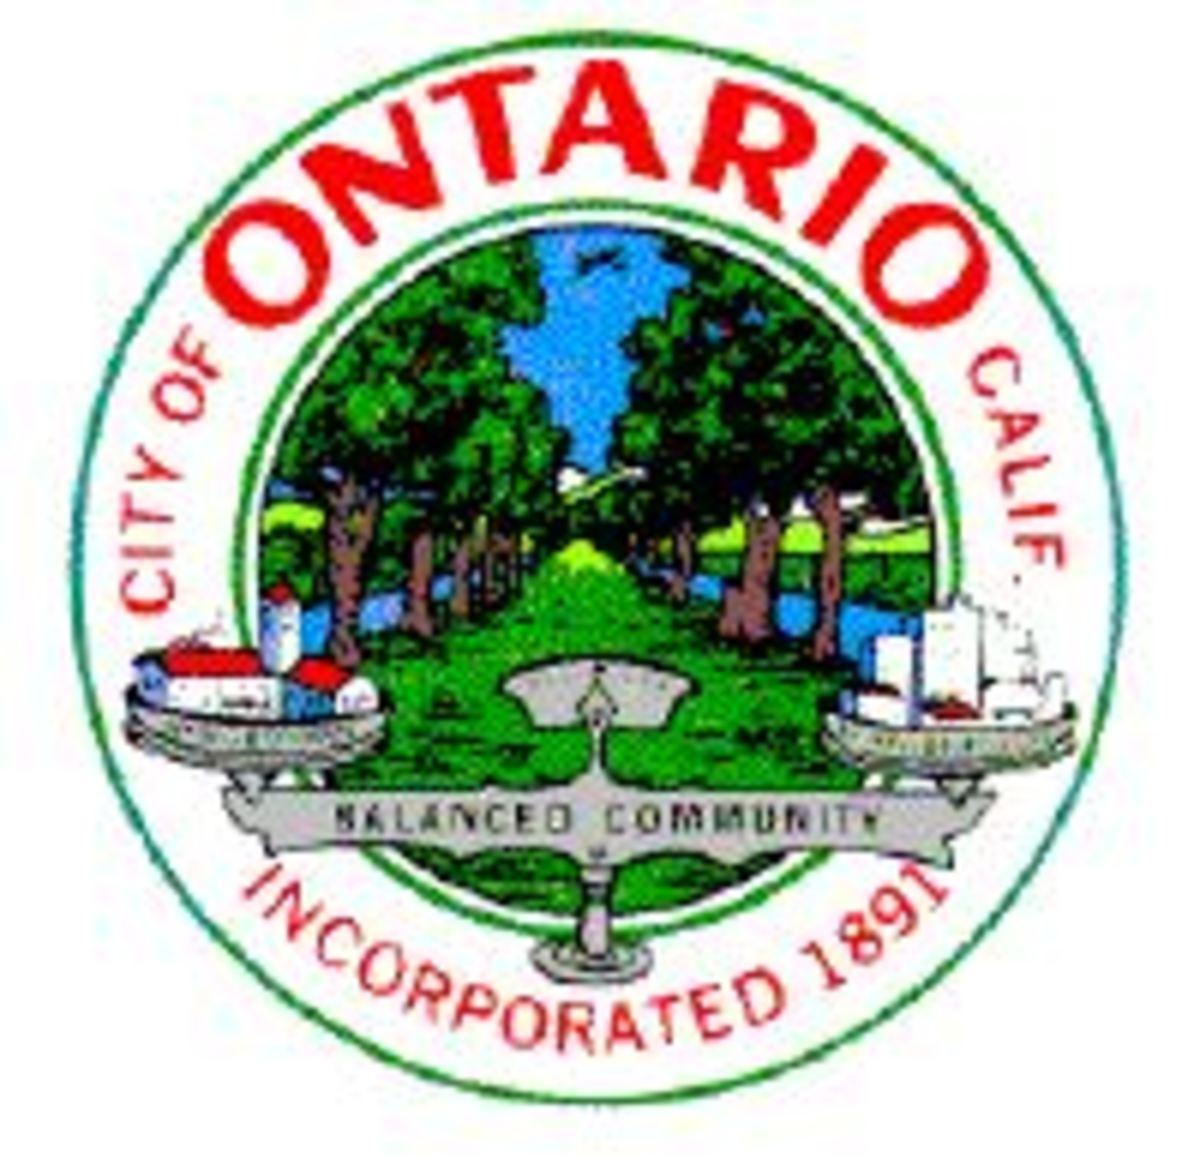 Ontario_city_seal.jpg